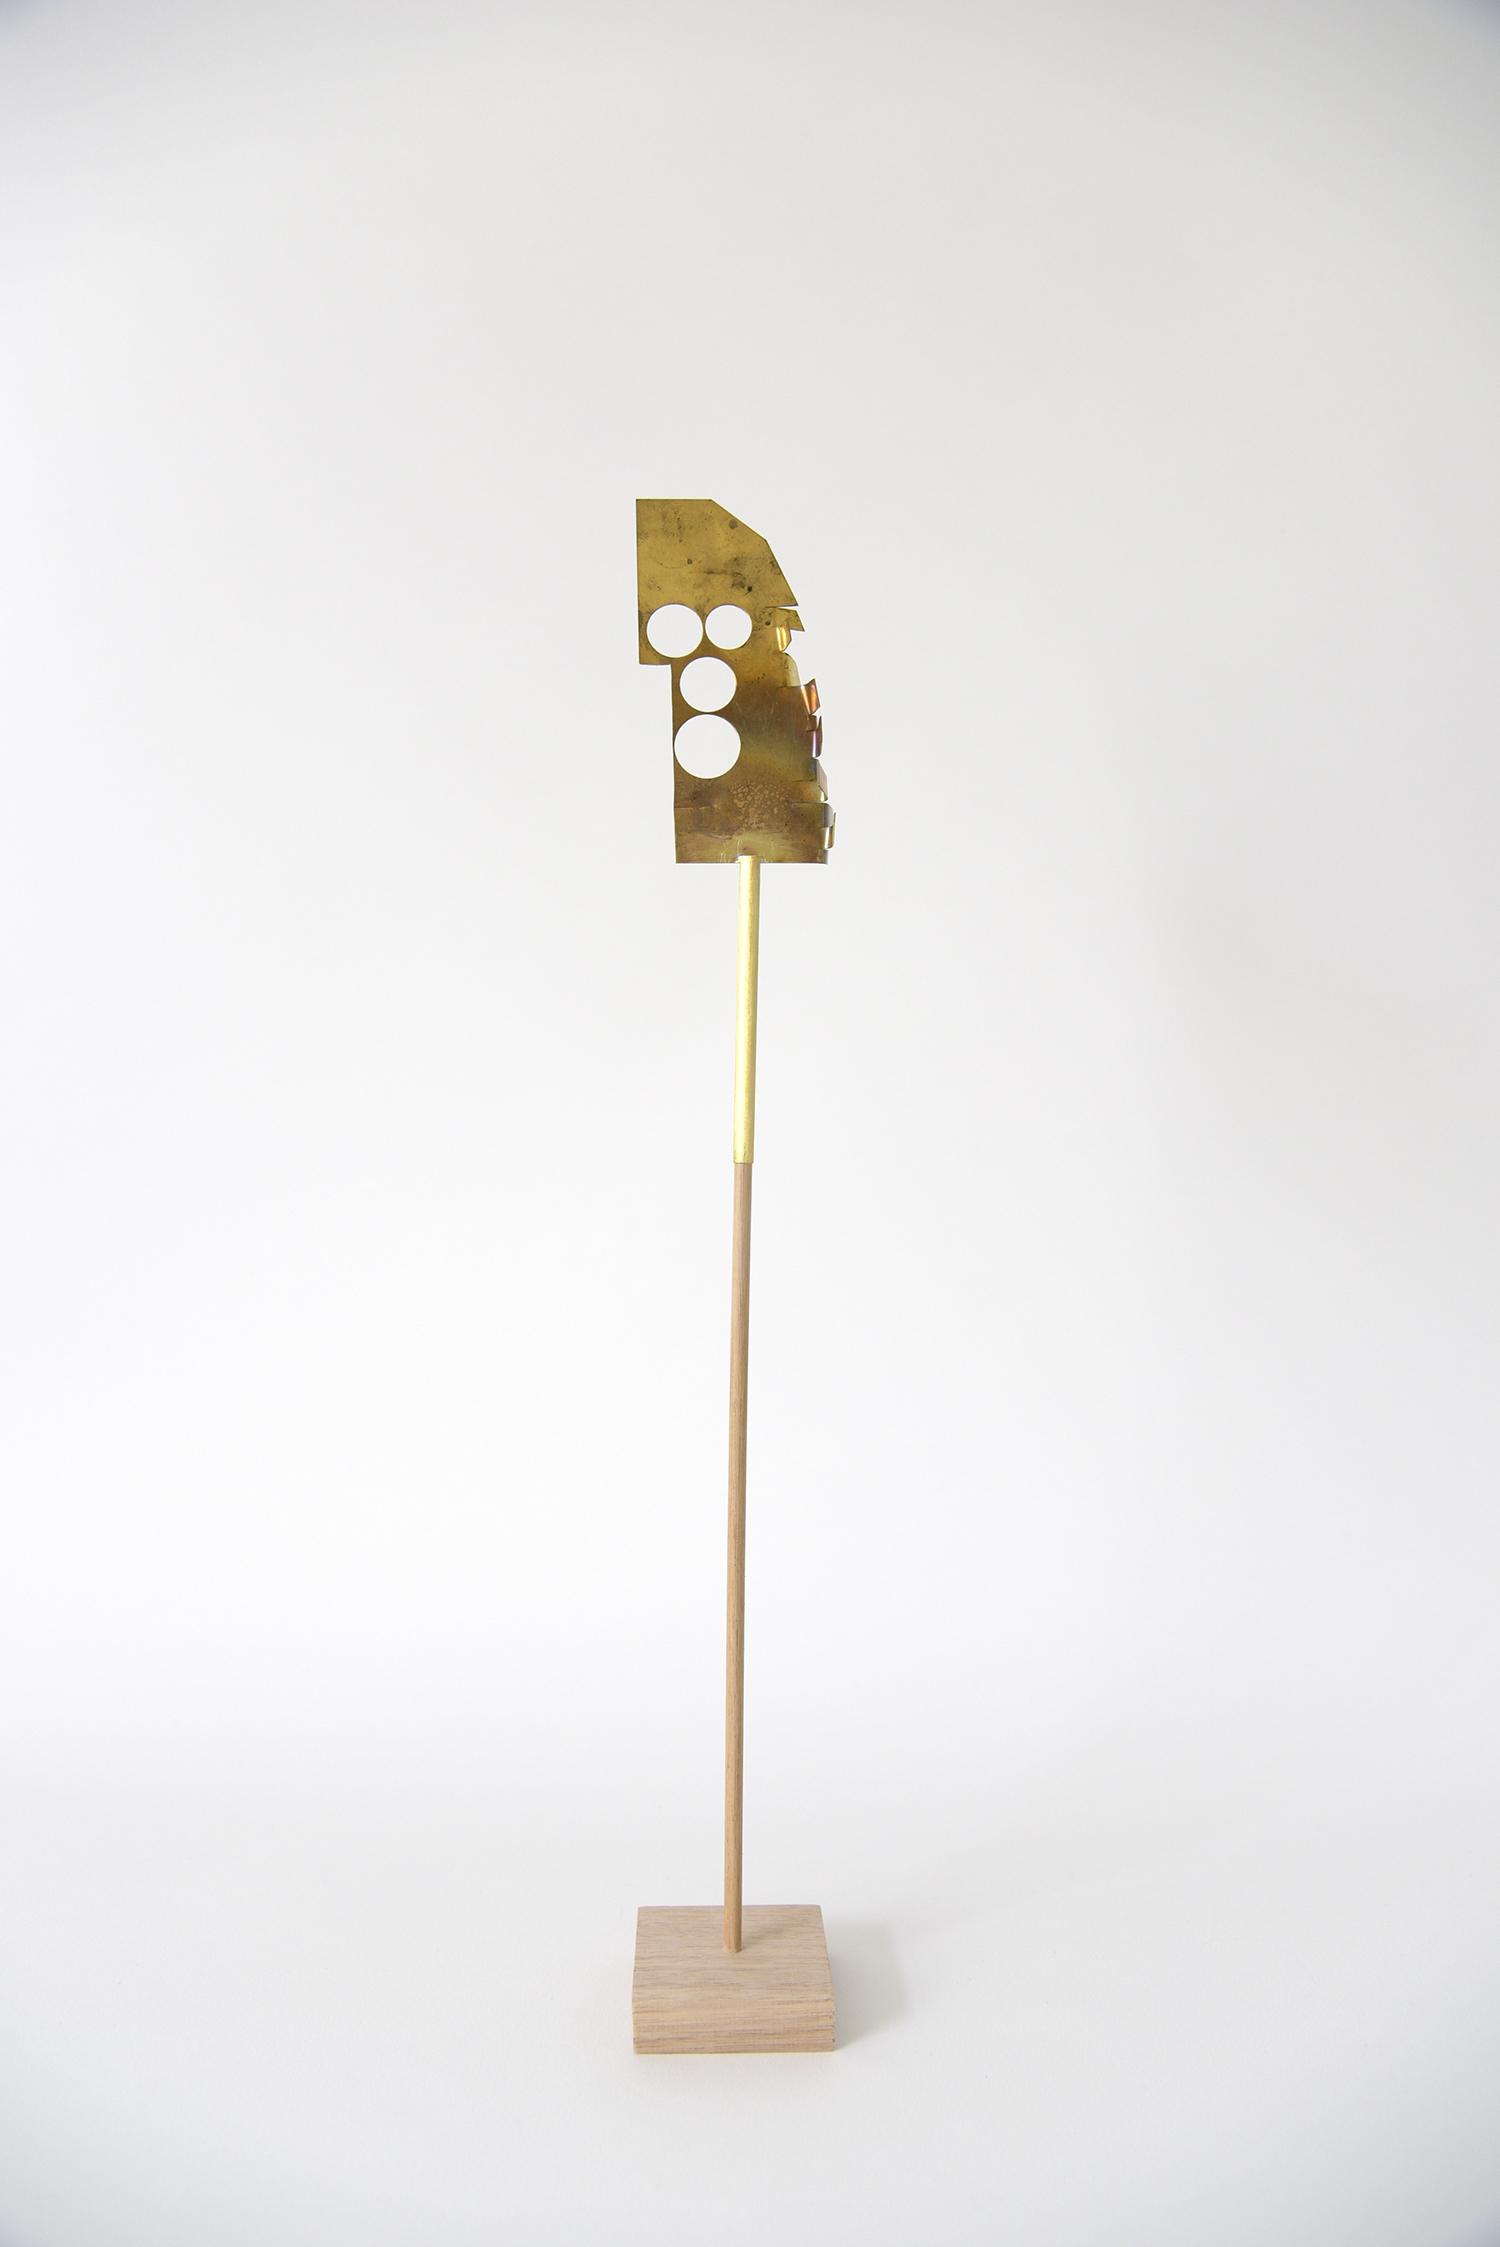 Hardbody Sculpture (Object) XVII,